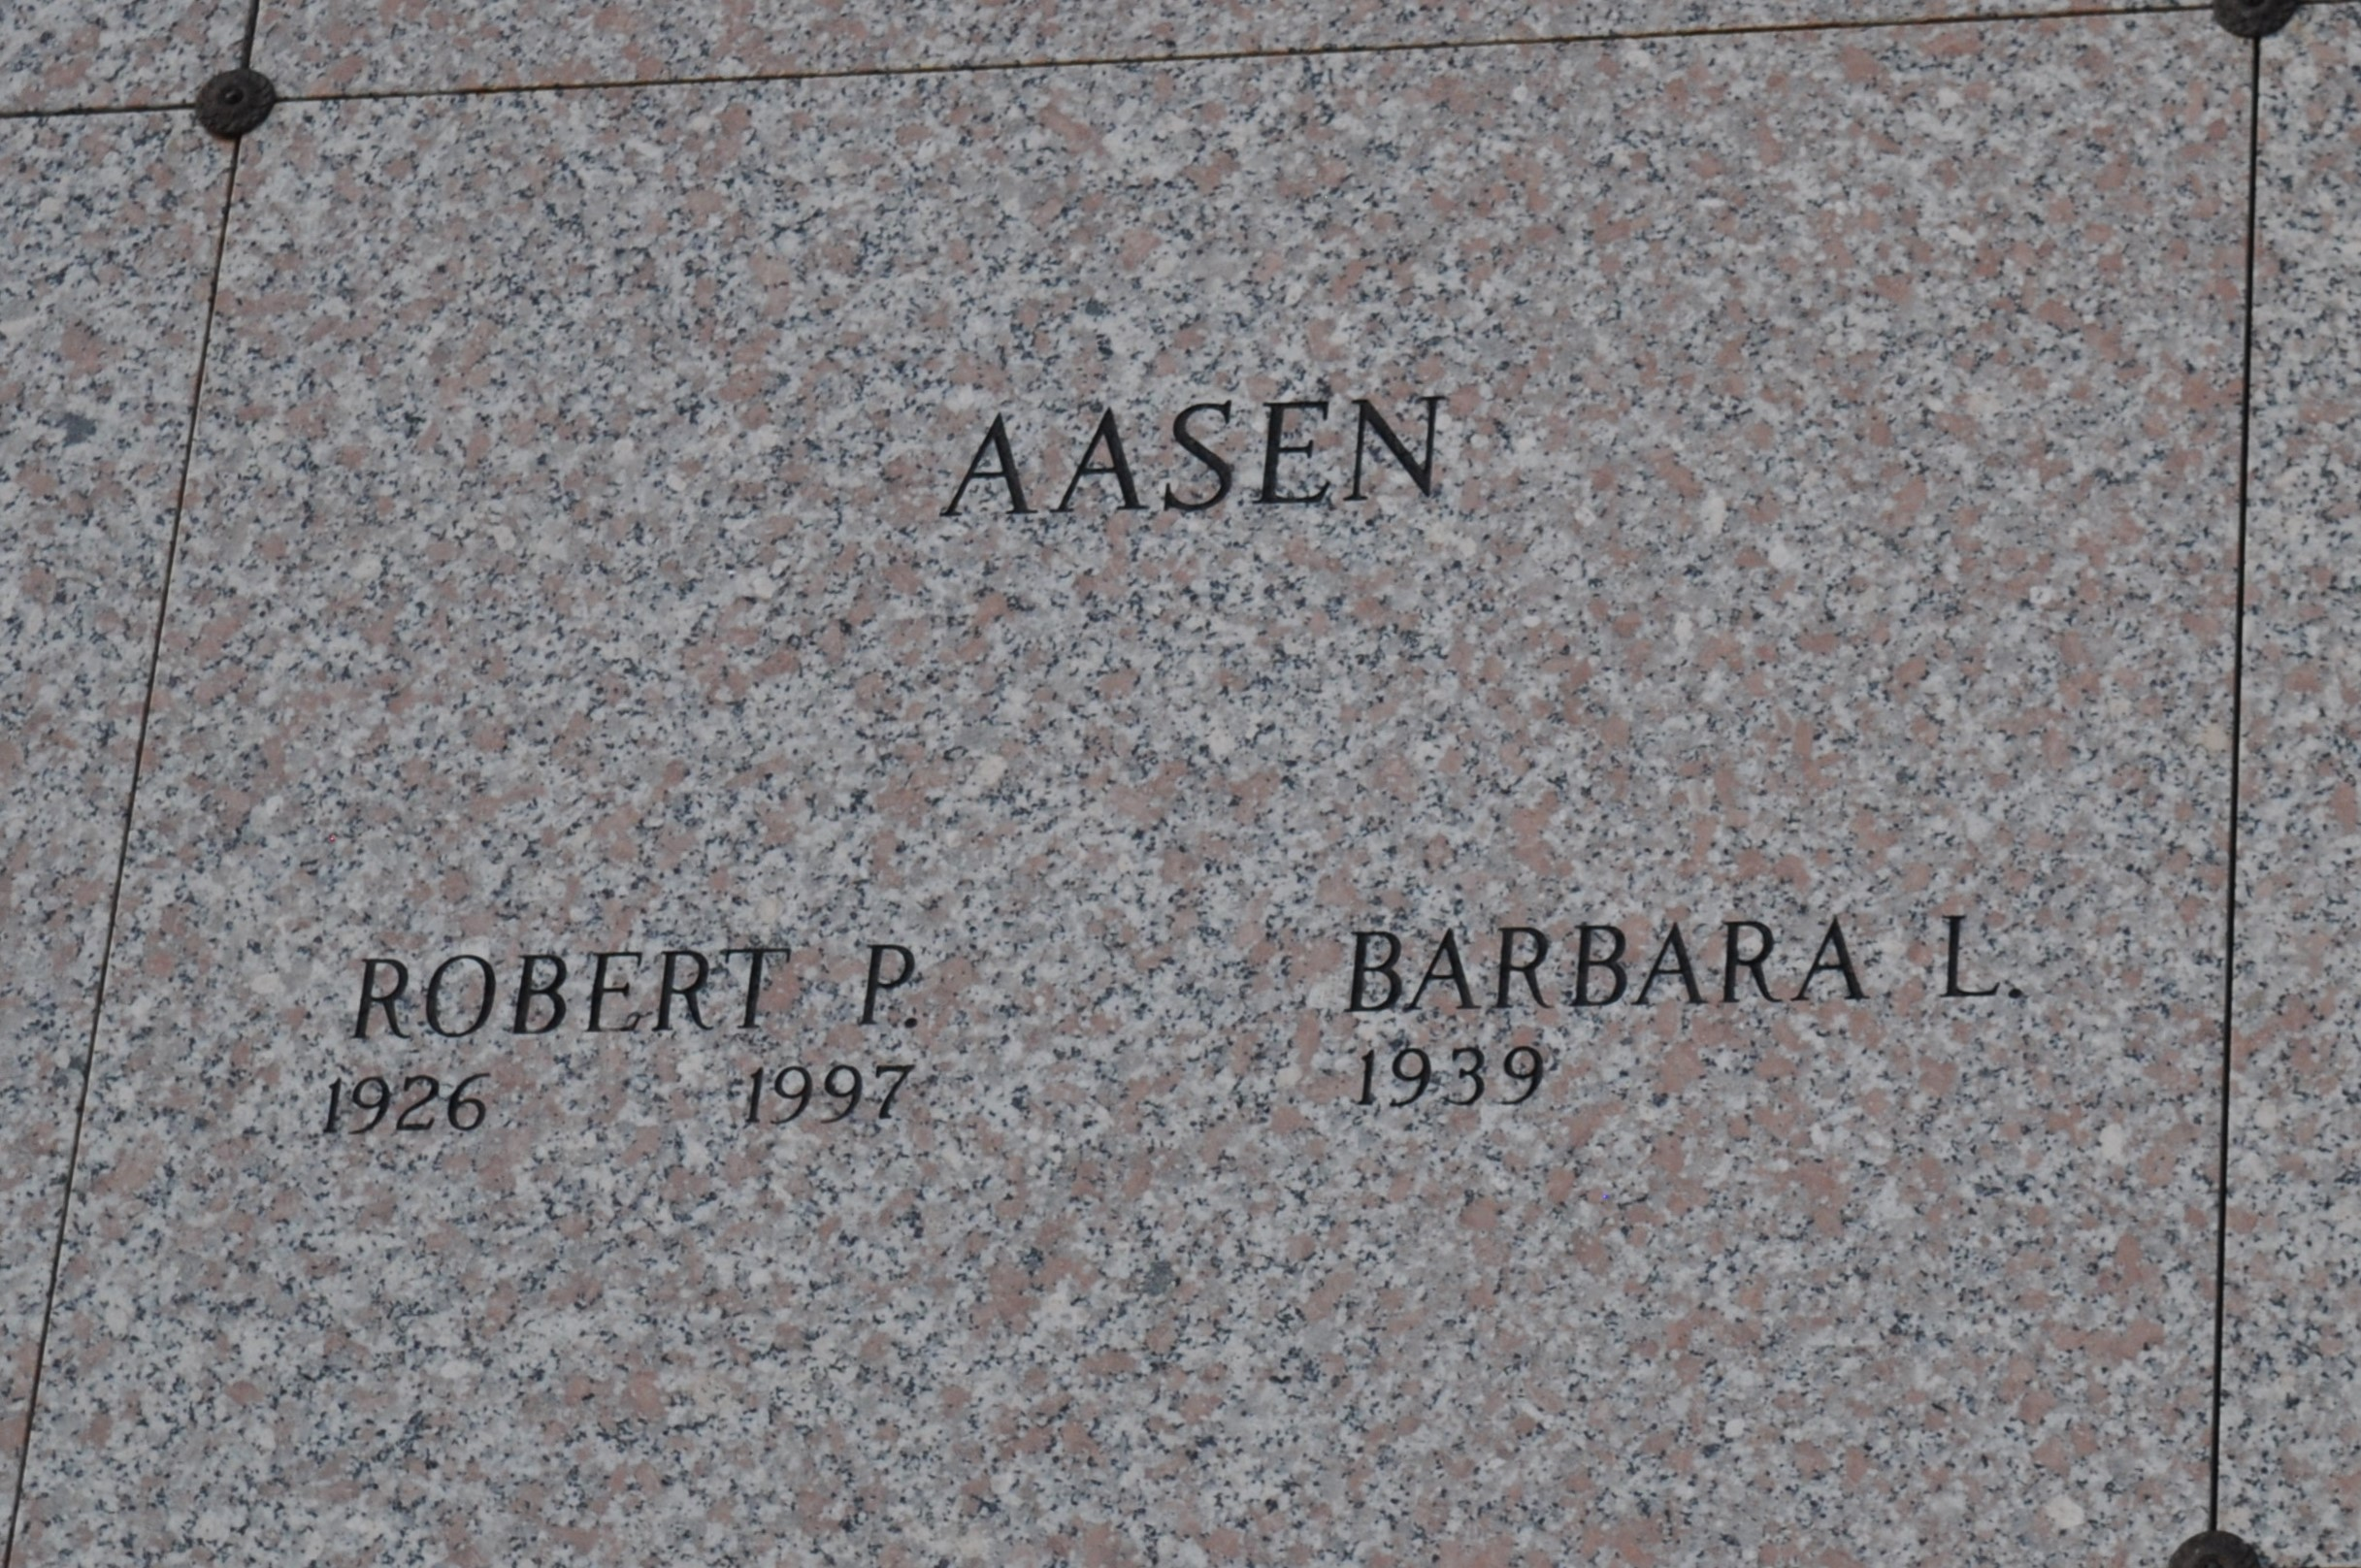 Robert P Aasen